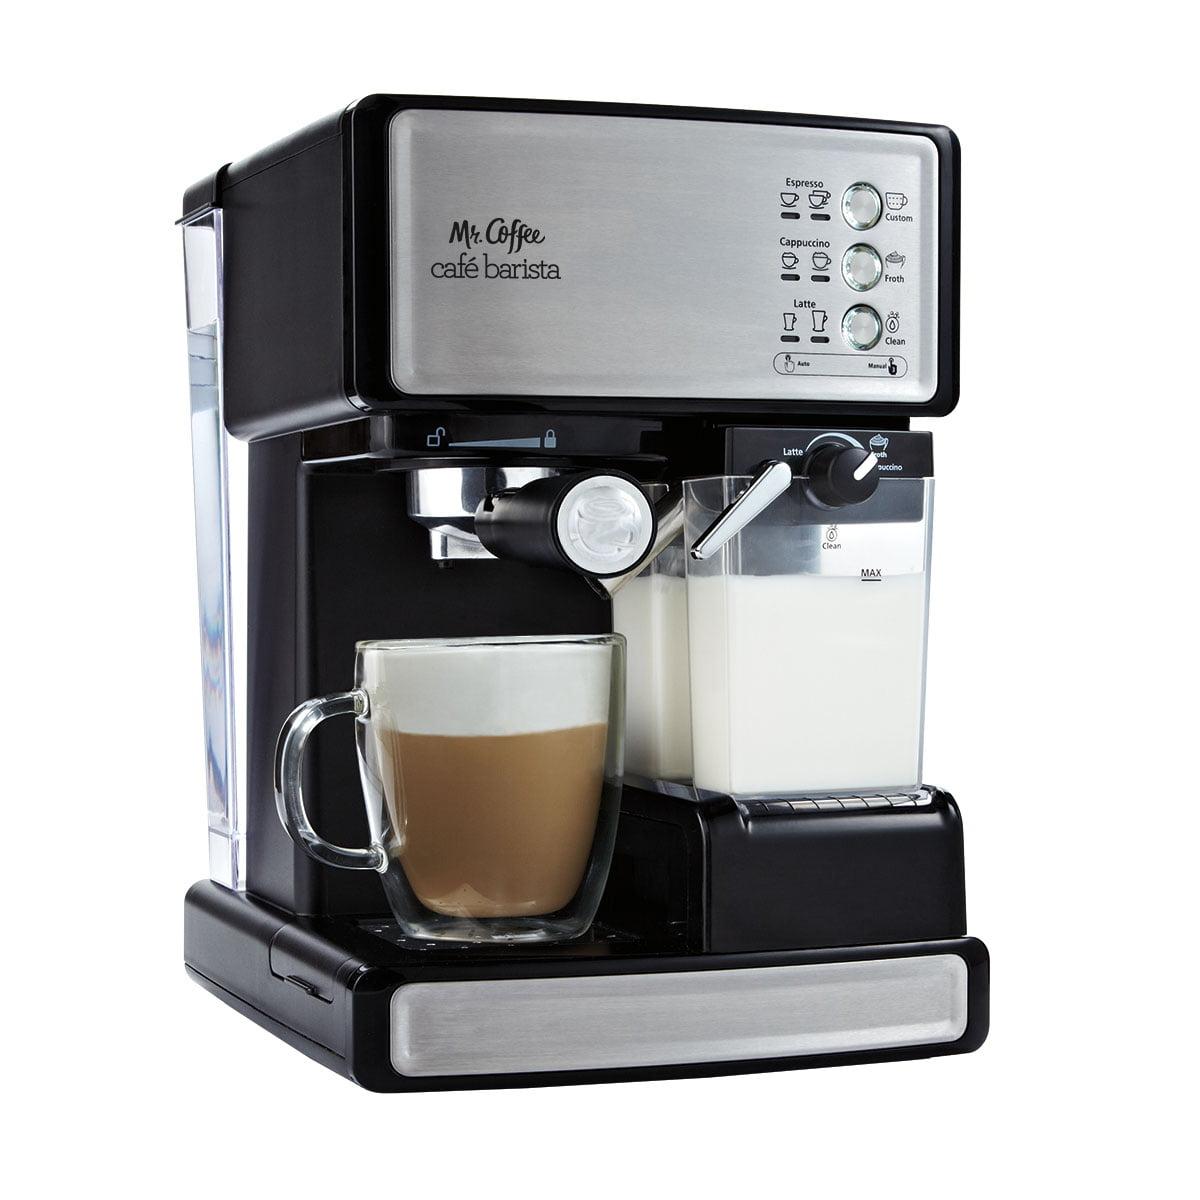 Mr. Coffee Cafe Barista Espresso Maker, Black/Silver (BVMC-ECMP1000)